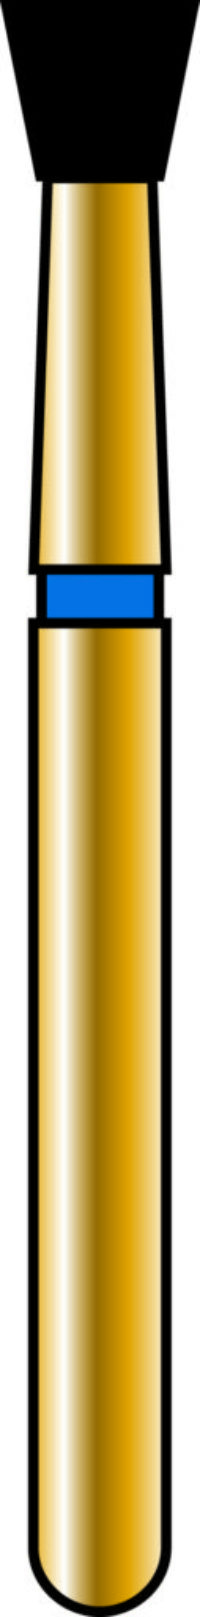 Inverted Cone 23-2.1mm Gold Diamond Bur - Coarse Grit